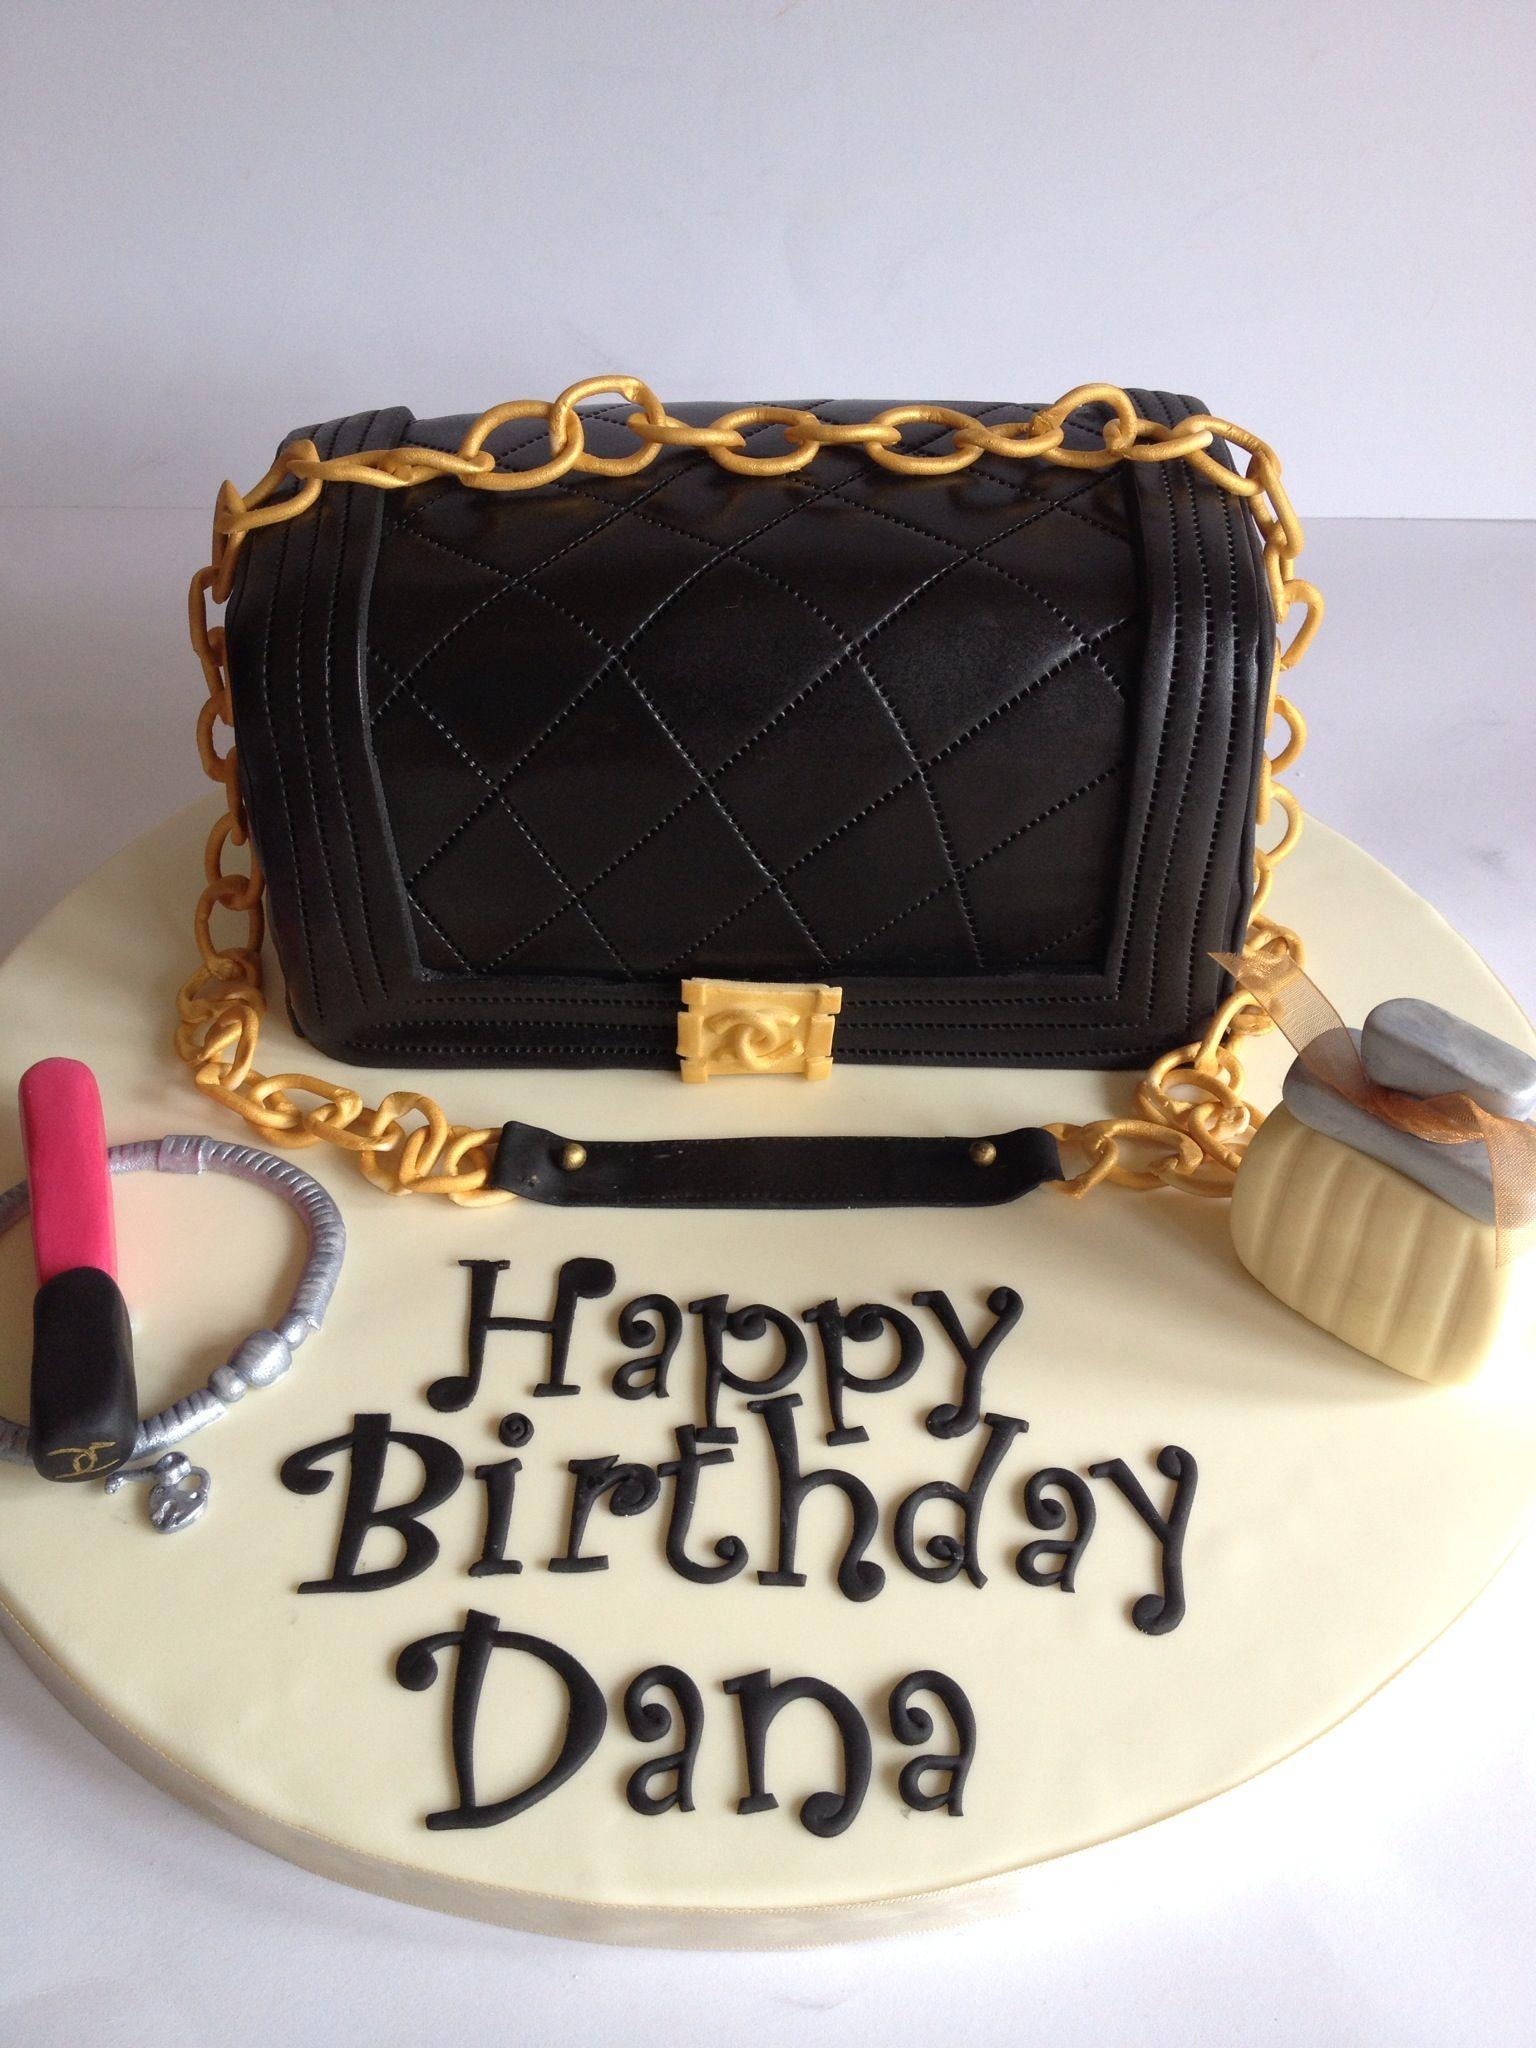 59d87731d319 Chanel Boy handbag cake www.facebook.com/jojocakesheff | Chanel Boy ...